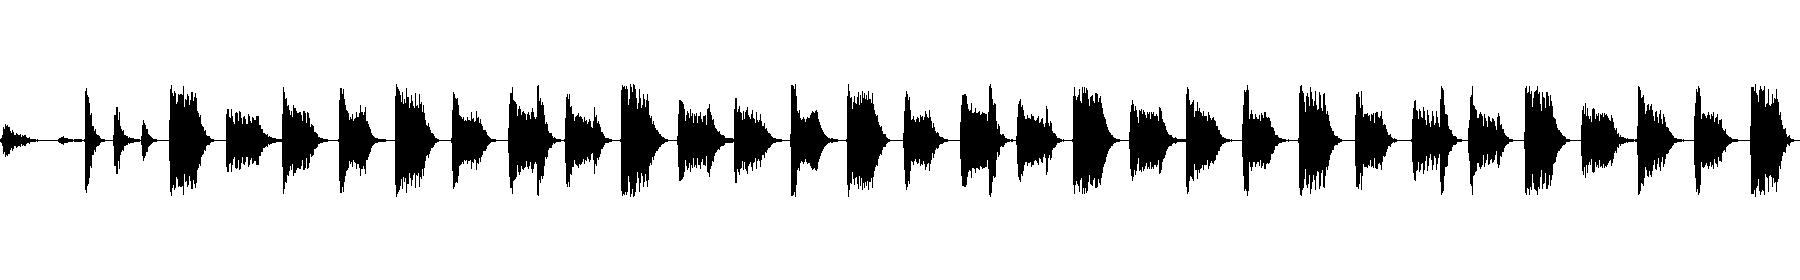 reso bass 2